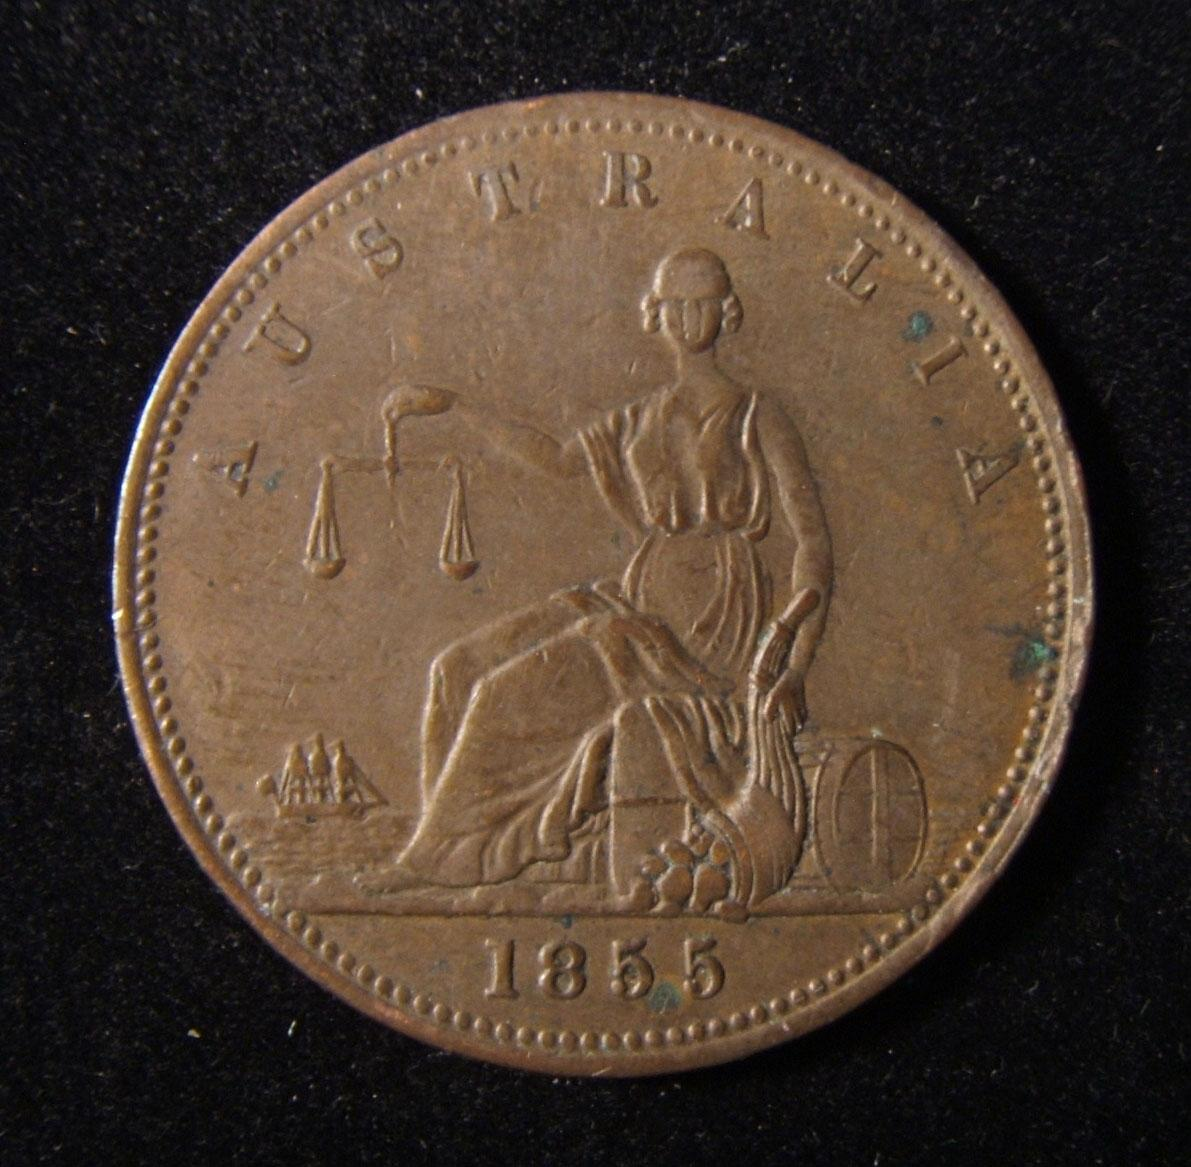 Australian Levy Brothers of Melbourne Jewish merchant Judaica Penny token 1855